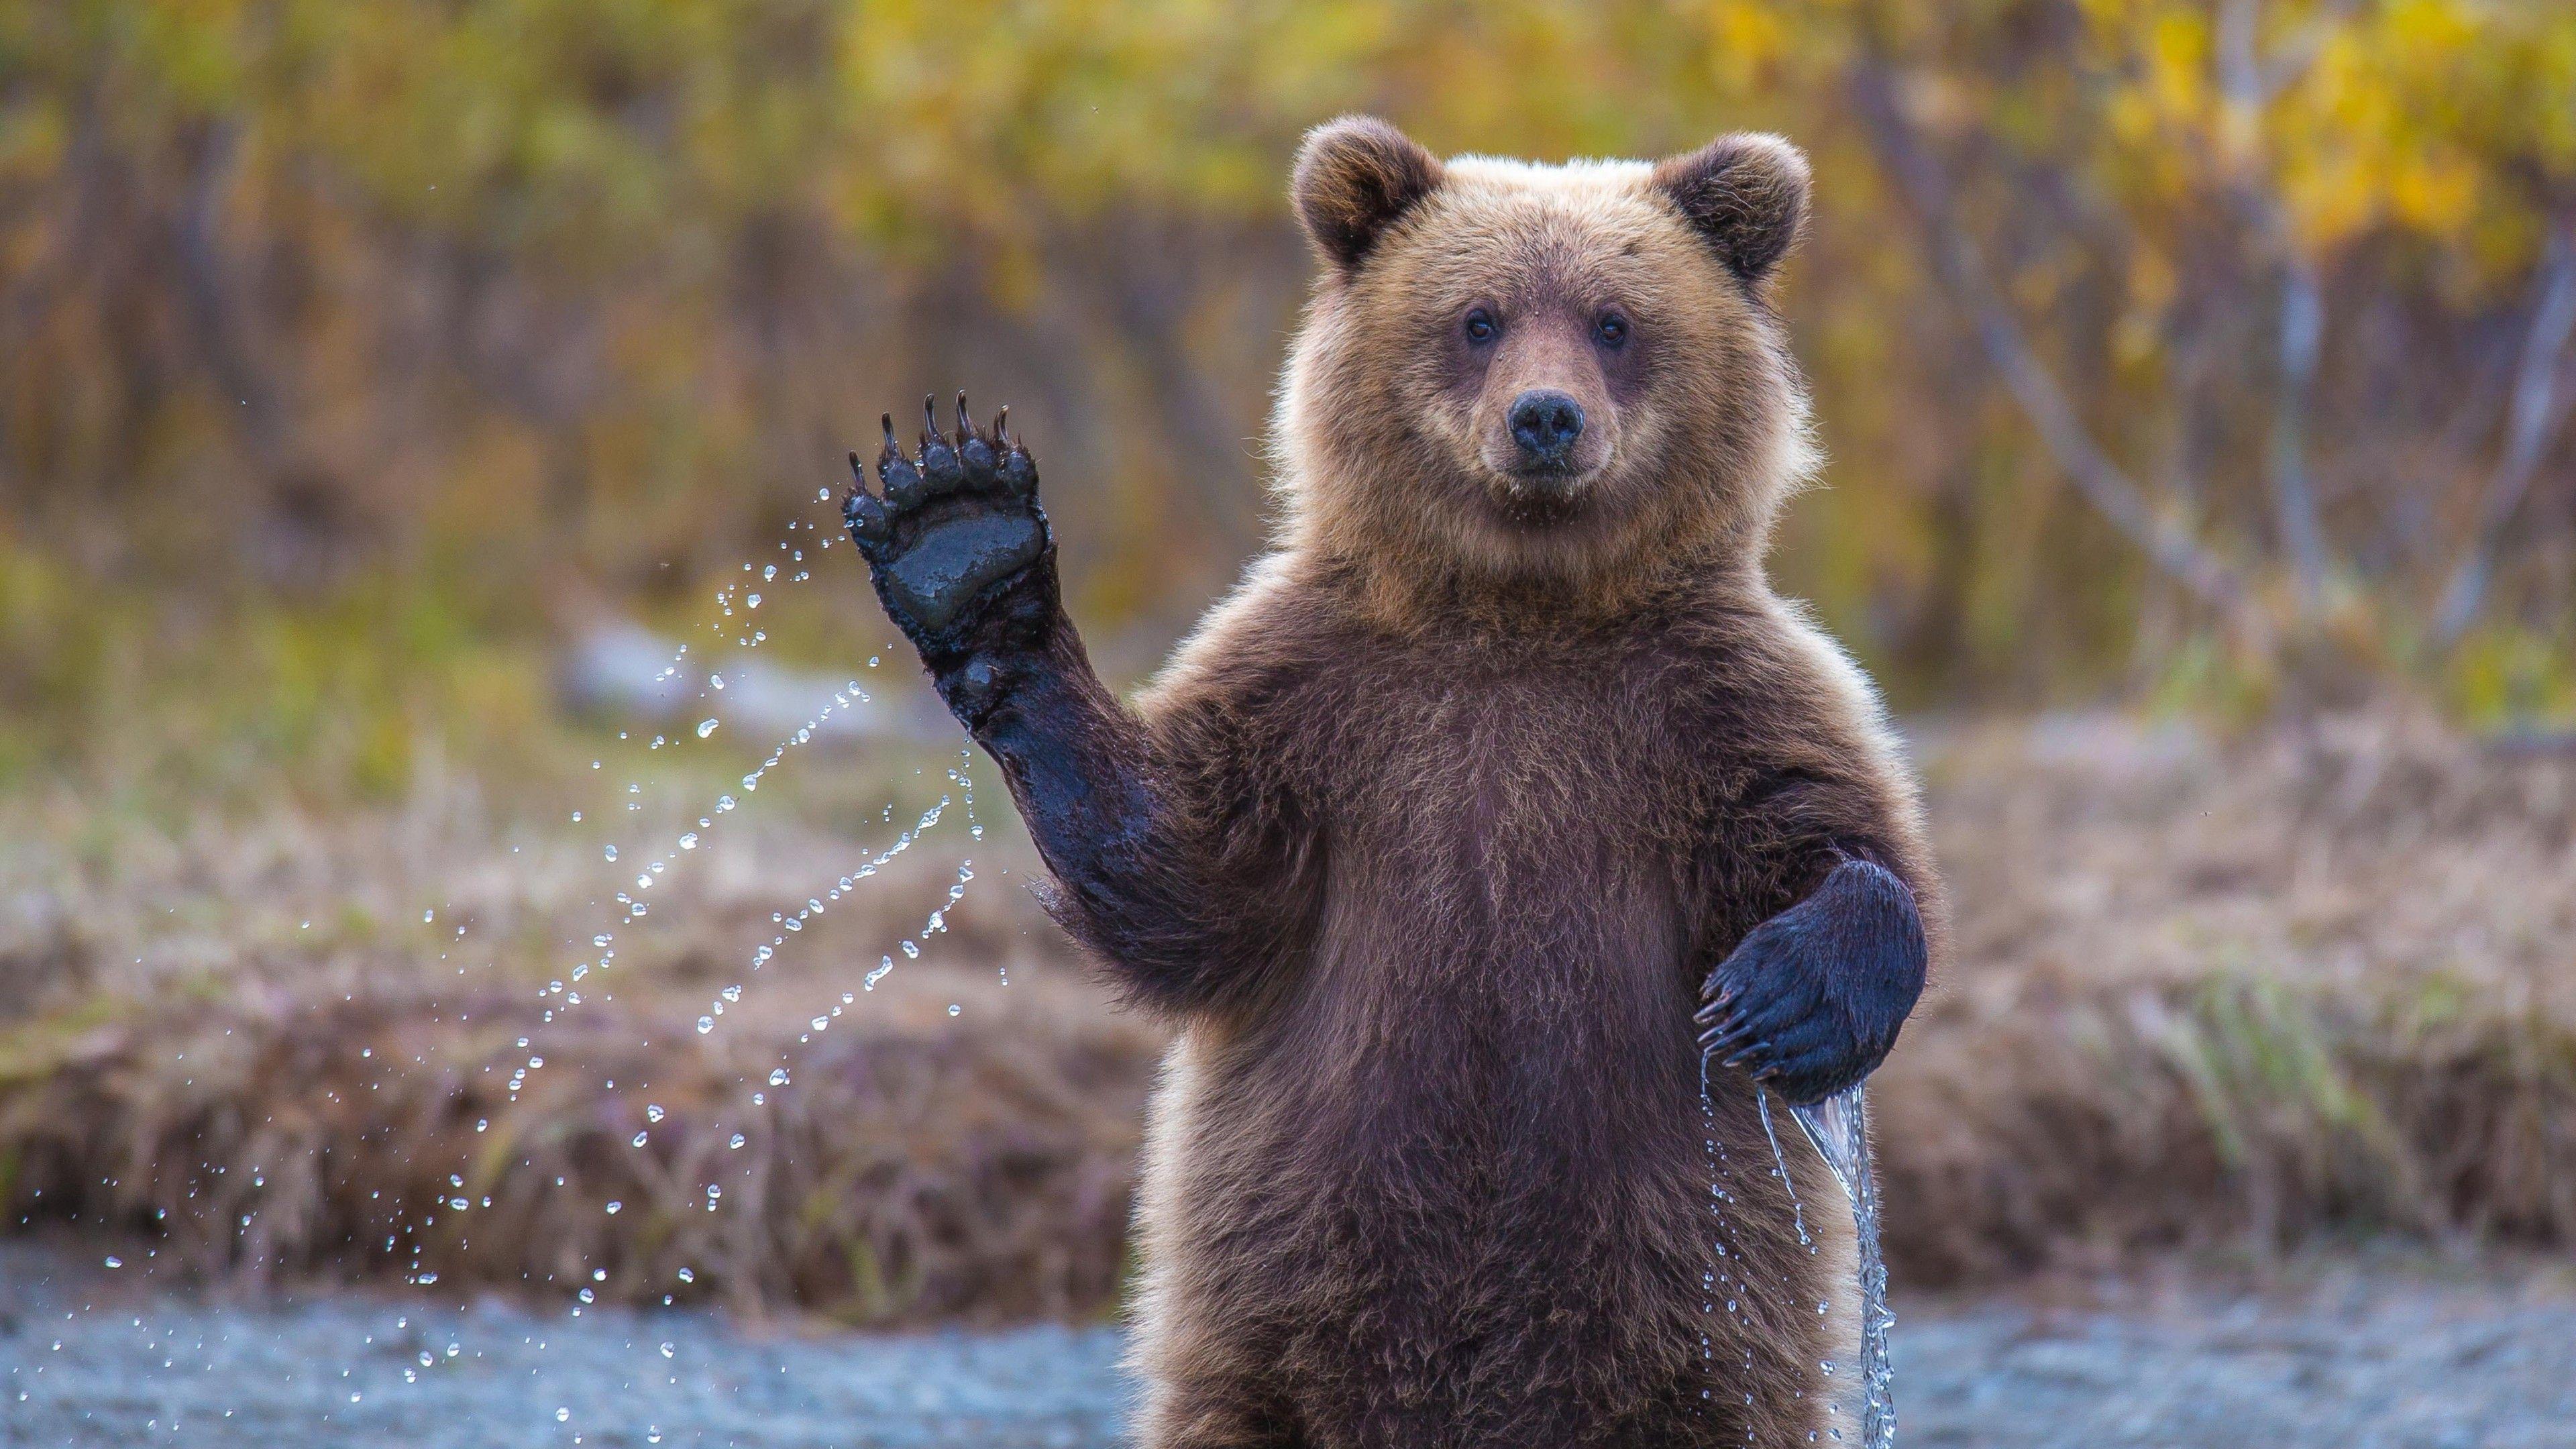 Bear, 4k, HD wallpaper, Hi, Water, National Geographic